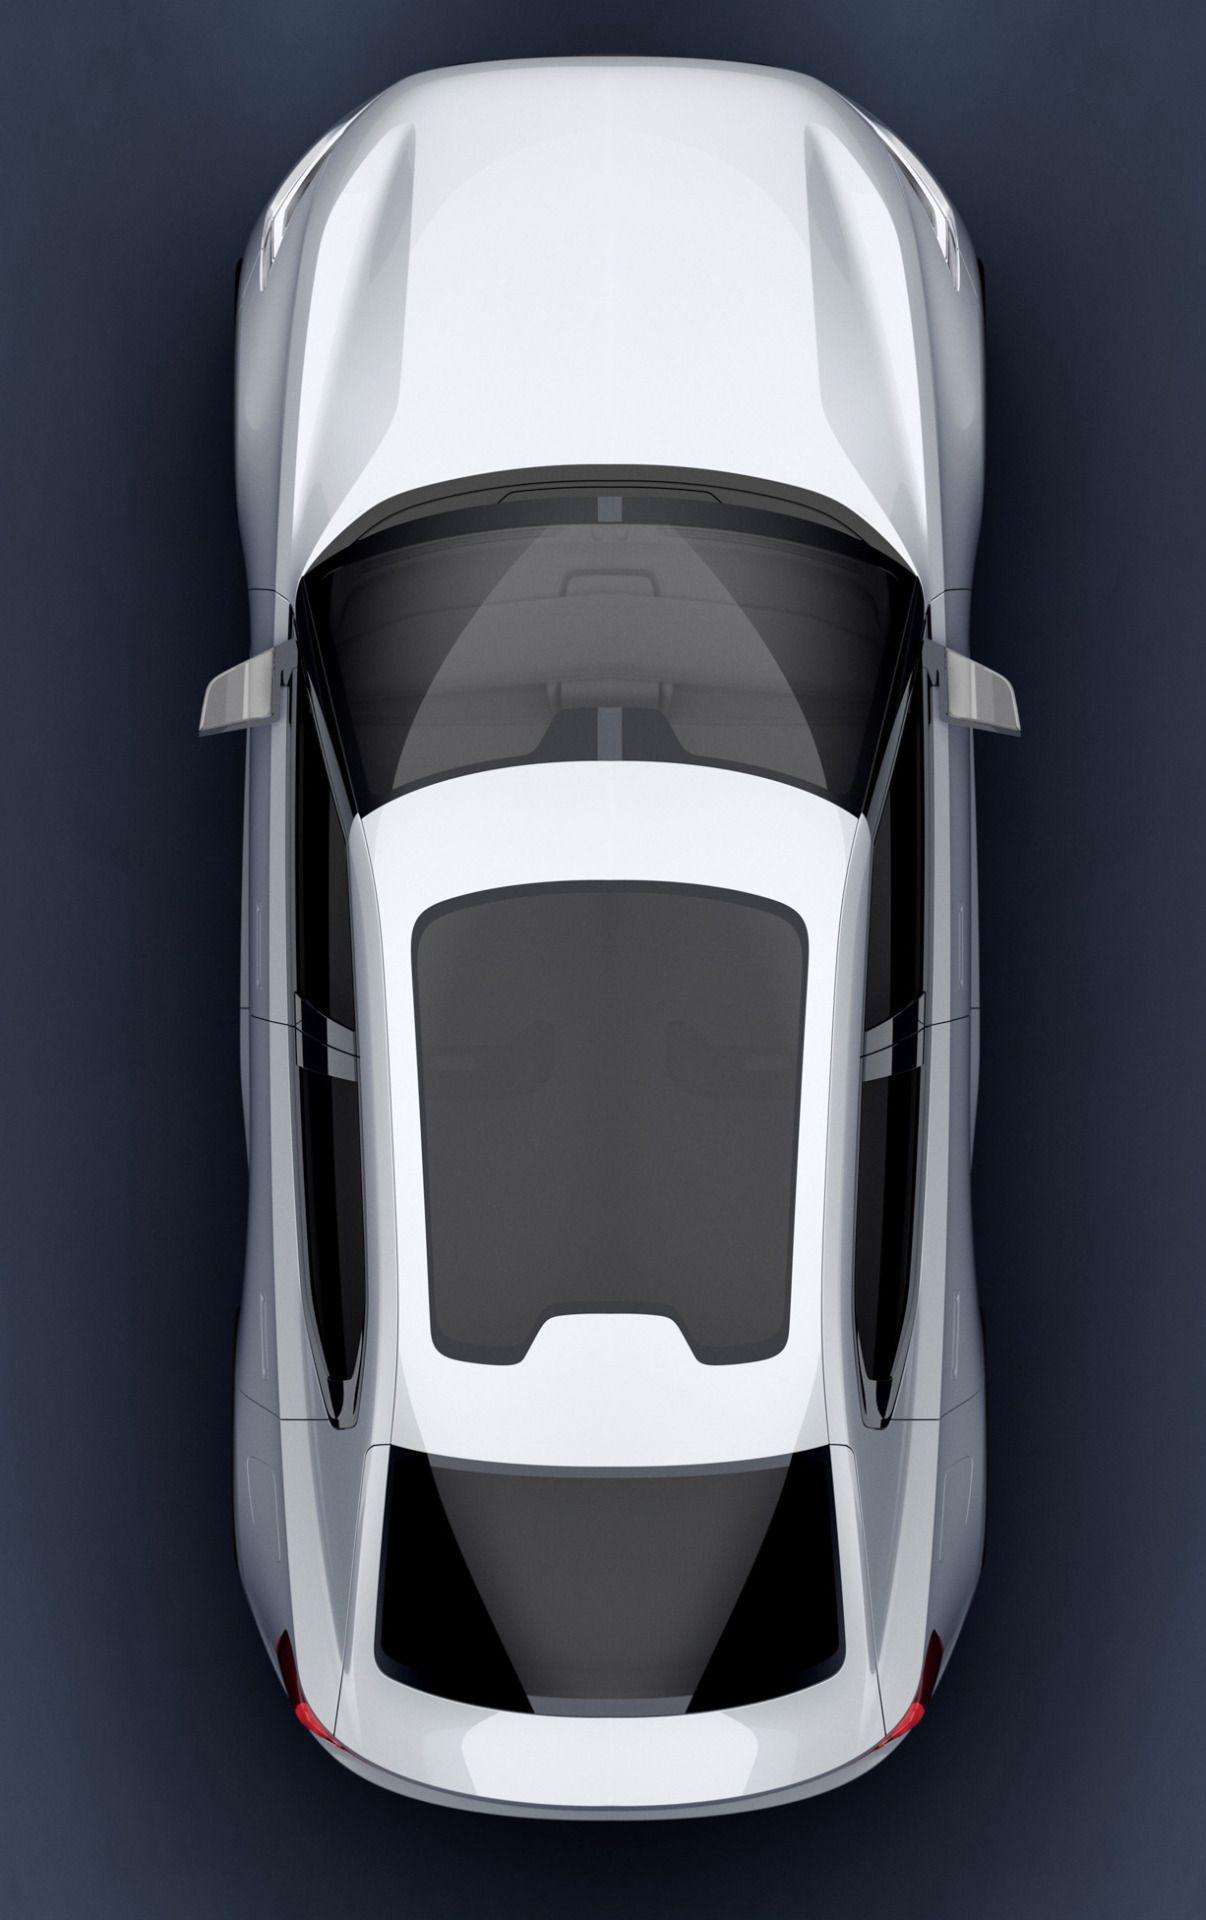 Gashetka Transportation Design Photo Futuristic Cars Transportation Design Tv Cars